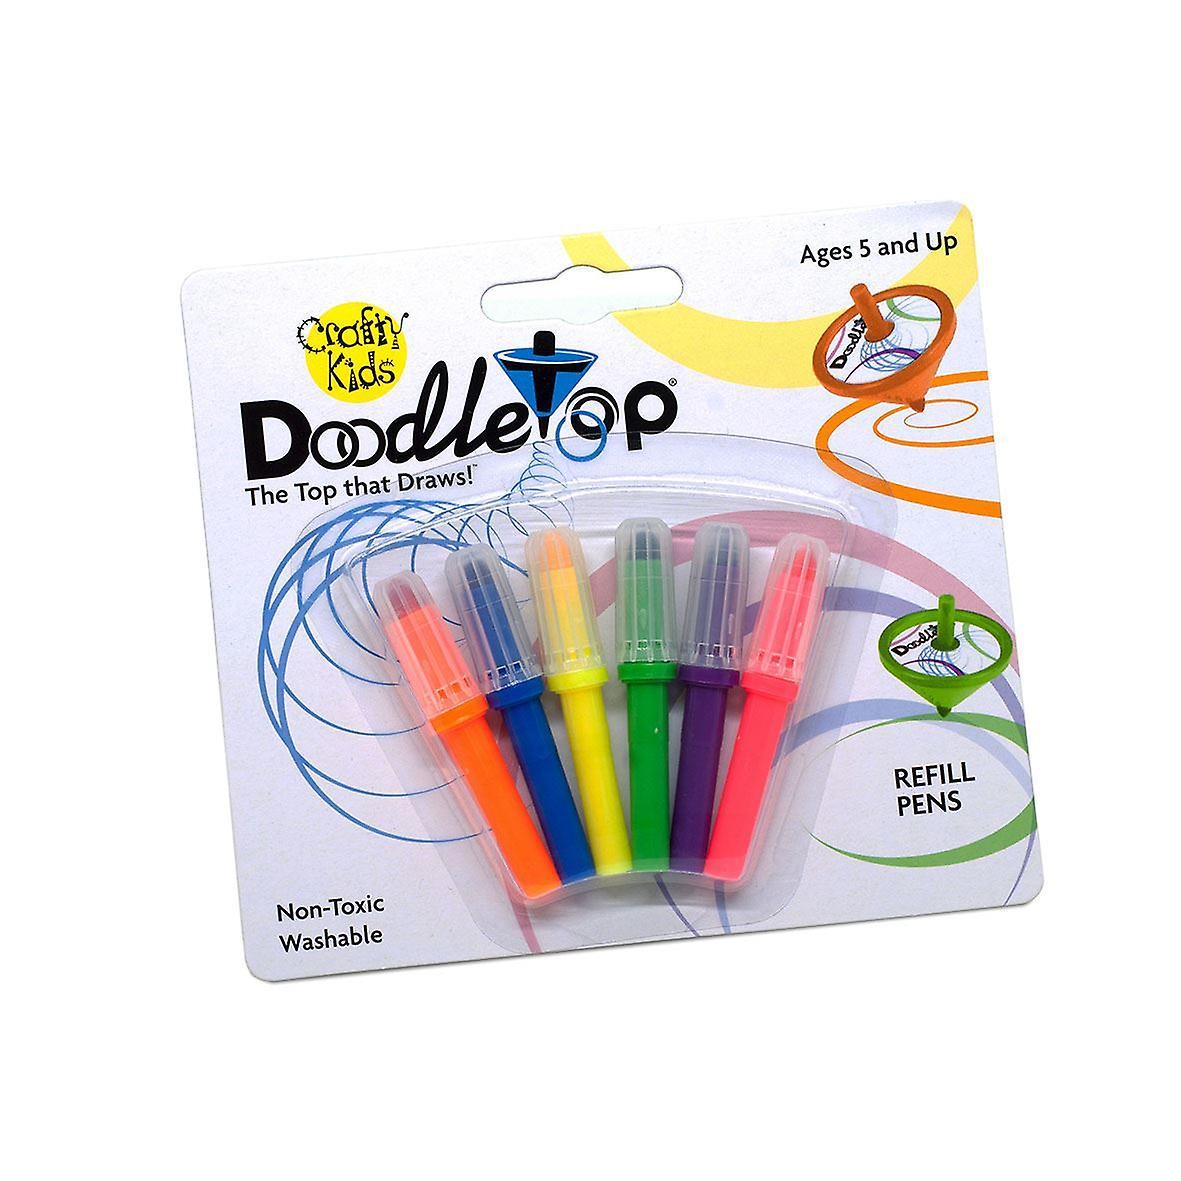 Crafty Kids Doodletop Refill Pens